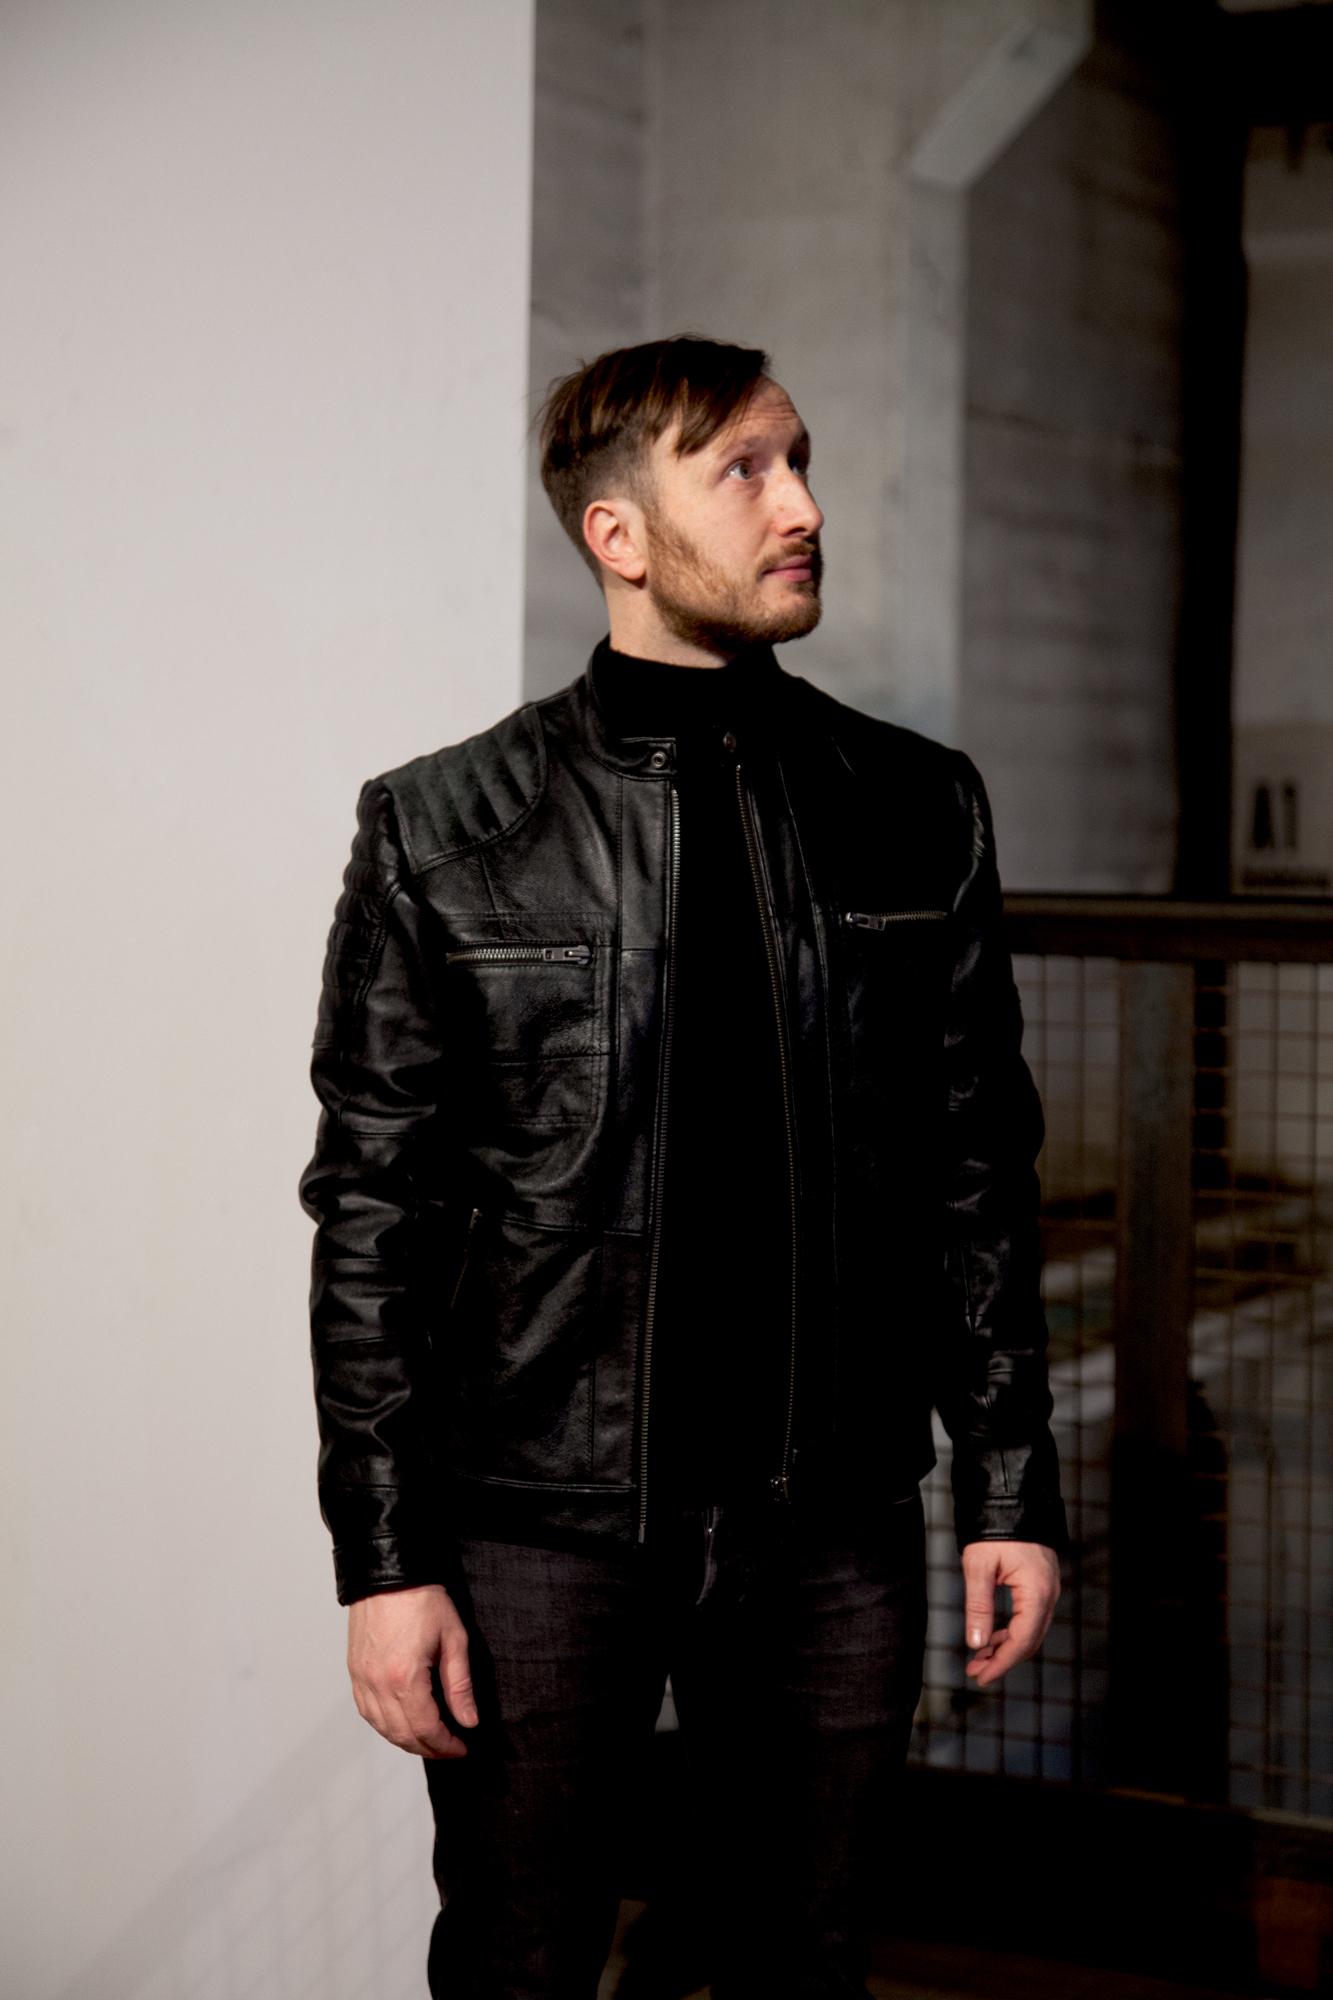 Fashion Changers | PrePEEK 2018 | Kraftwerk Berlin | Better World Fashion und FUNKTIONSCHNITT | Foto: Jana Braumüller | GROSS∆RTIG